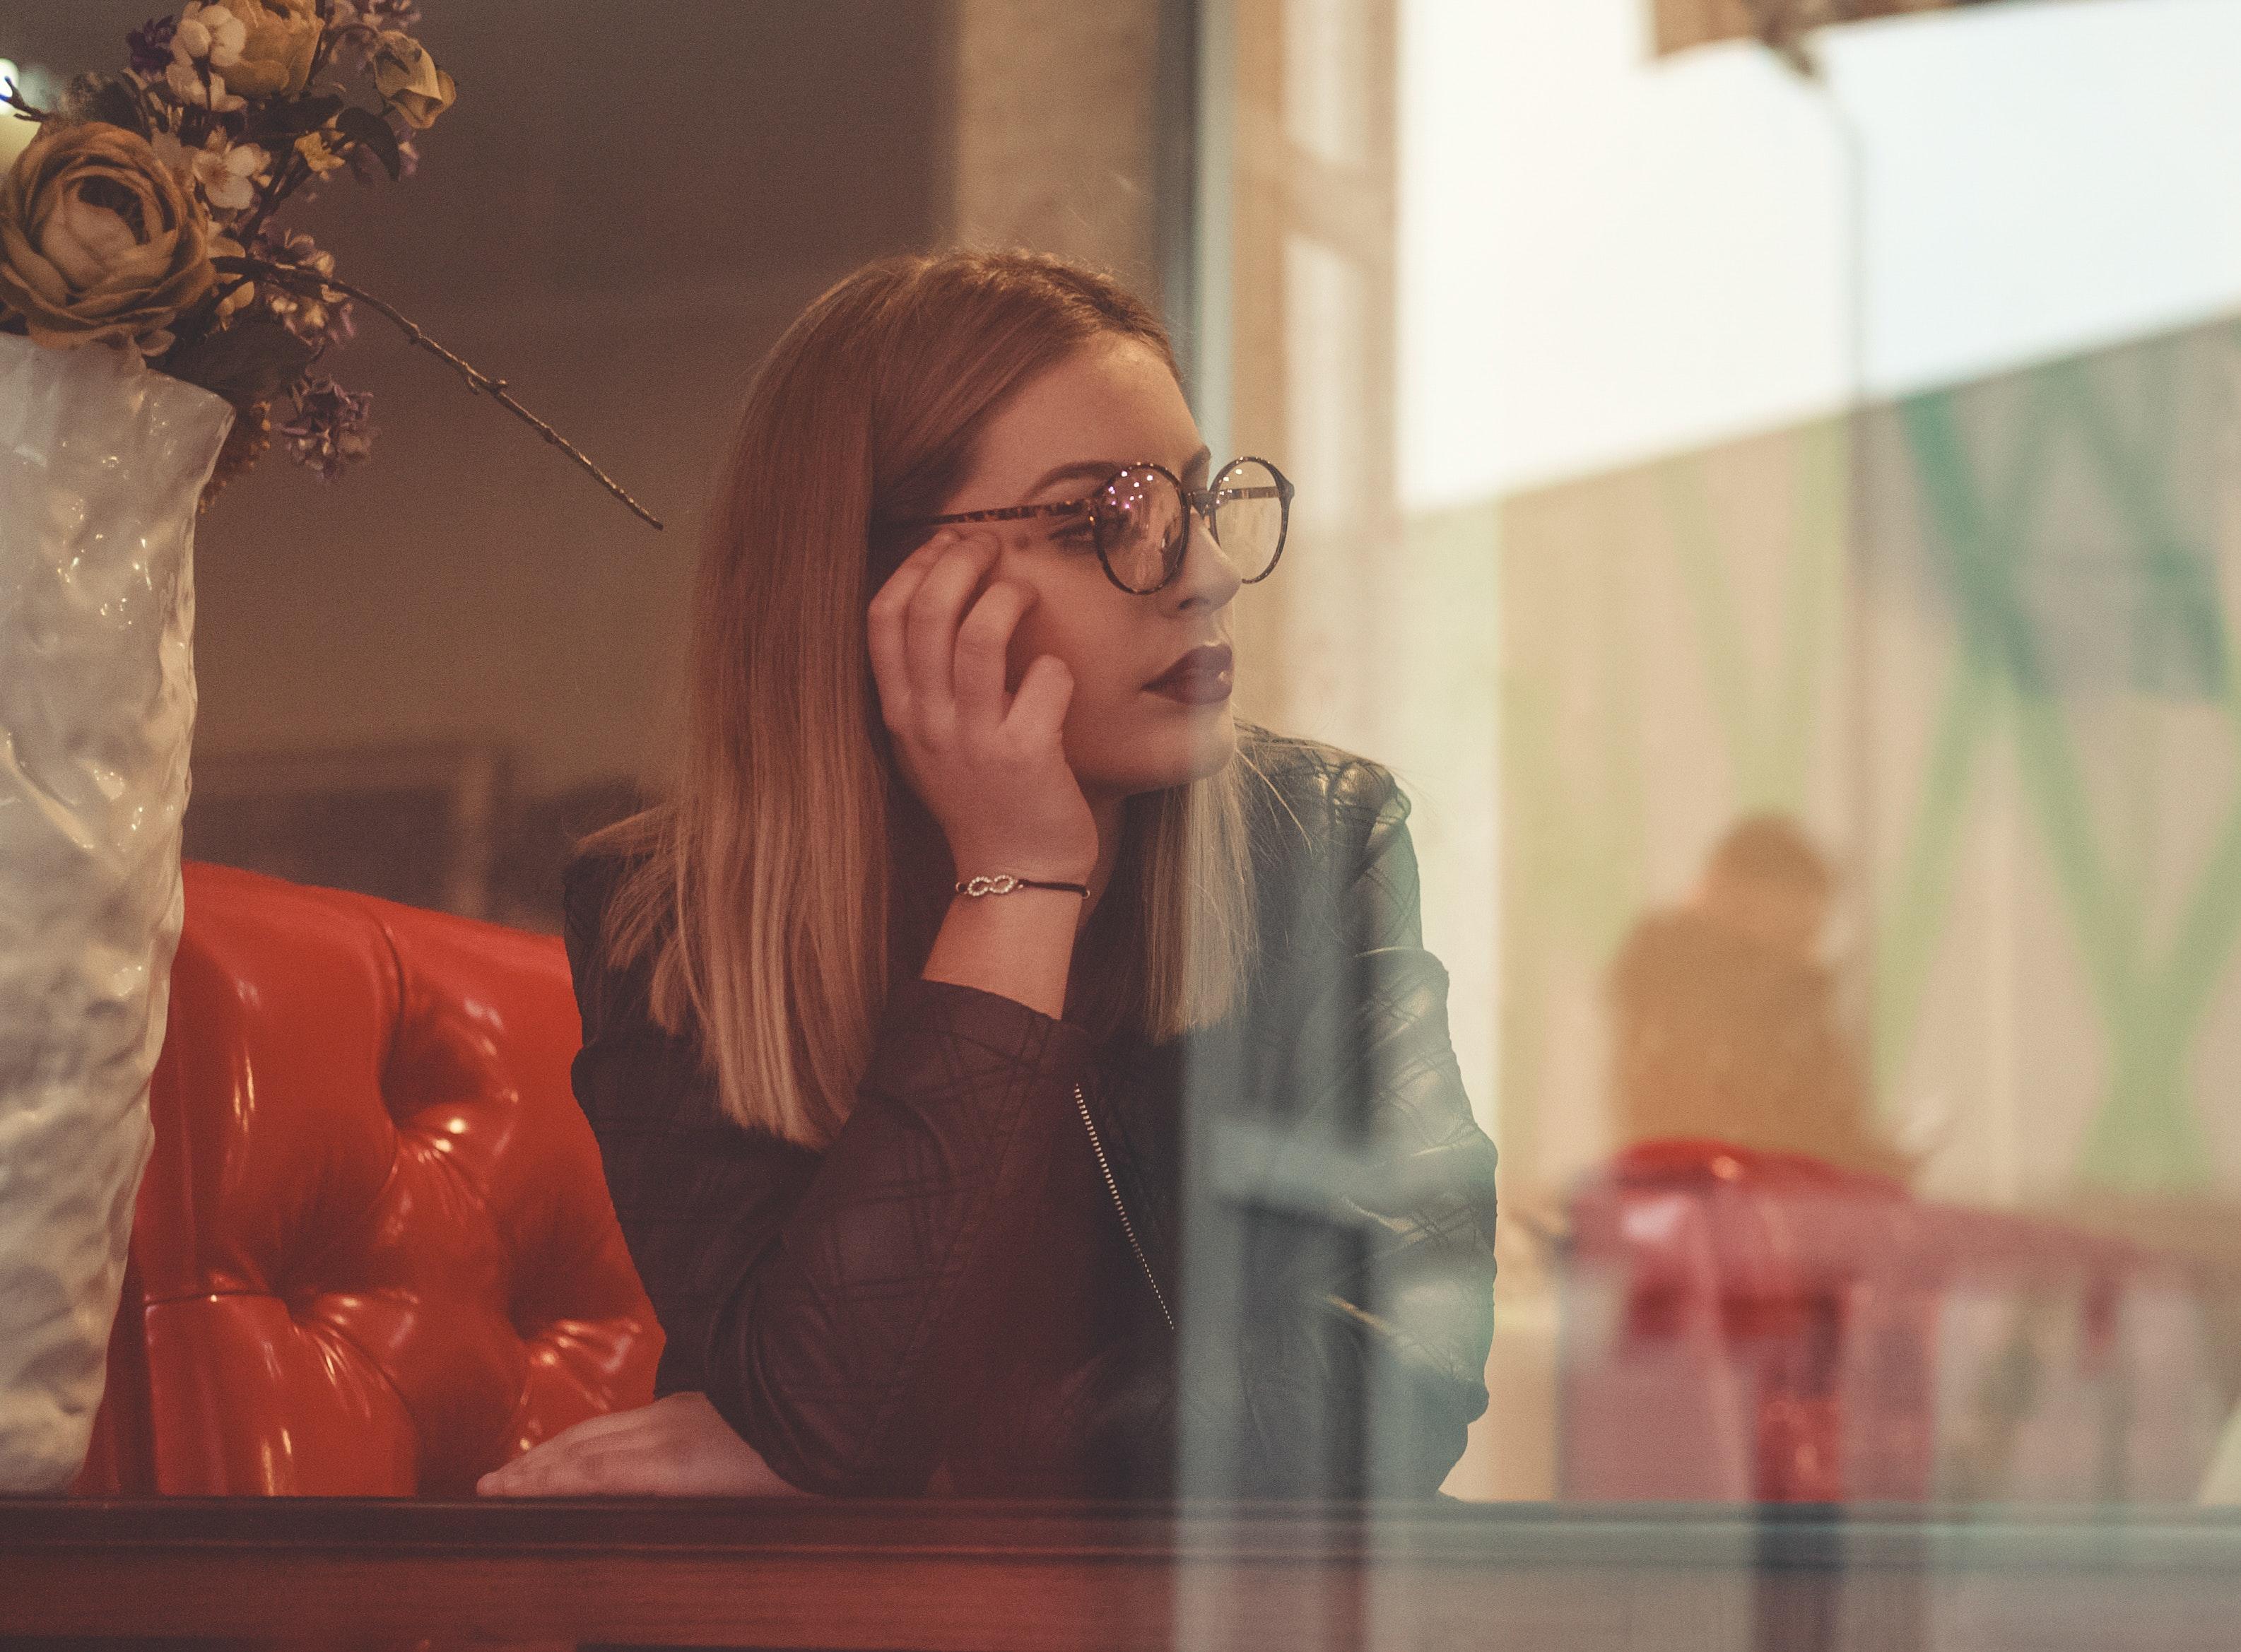 Woman wearing black jacket and black framed eyeglasses photo